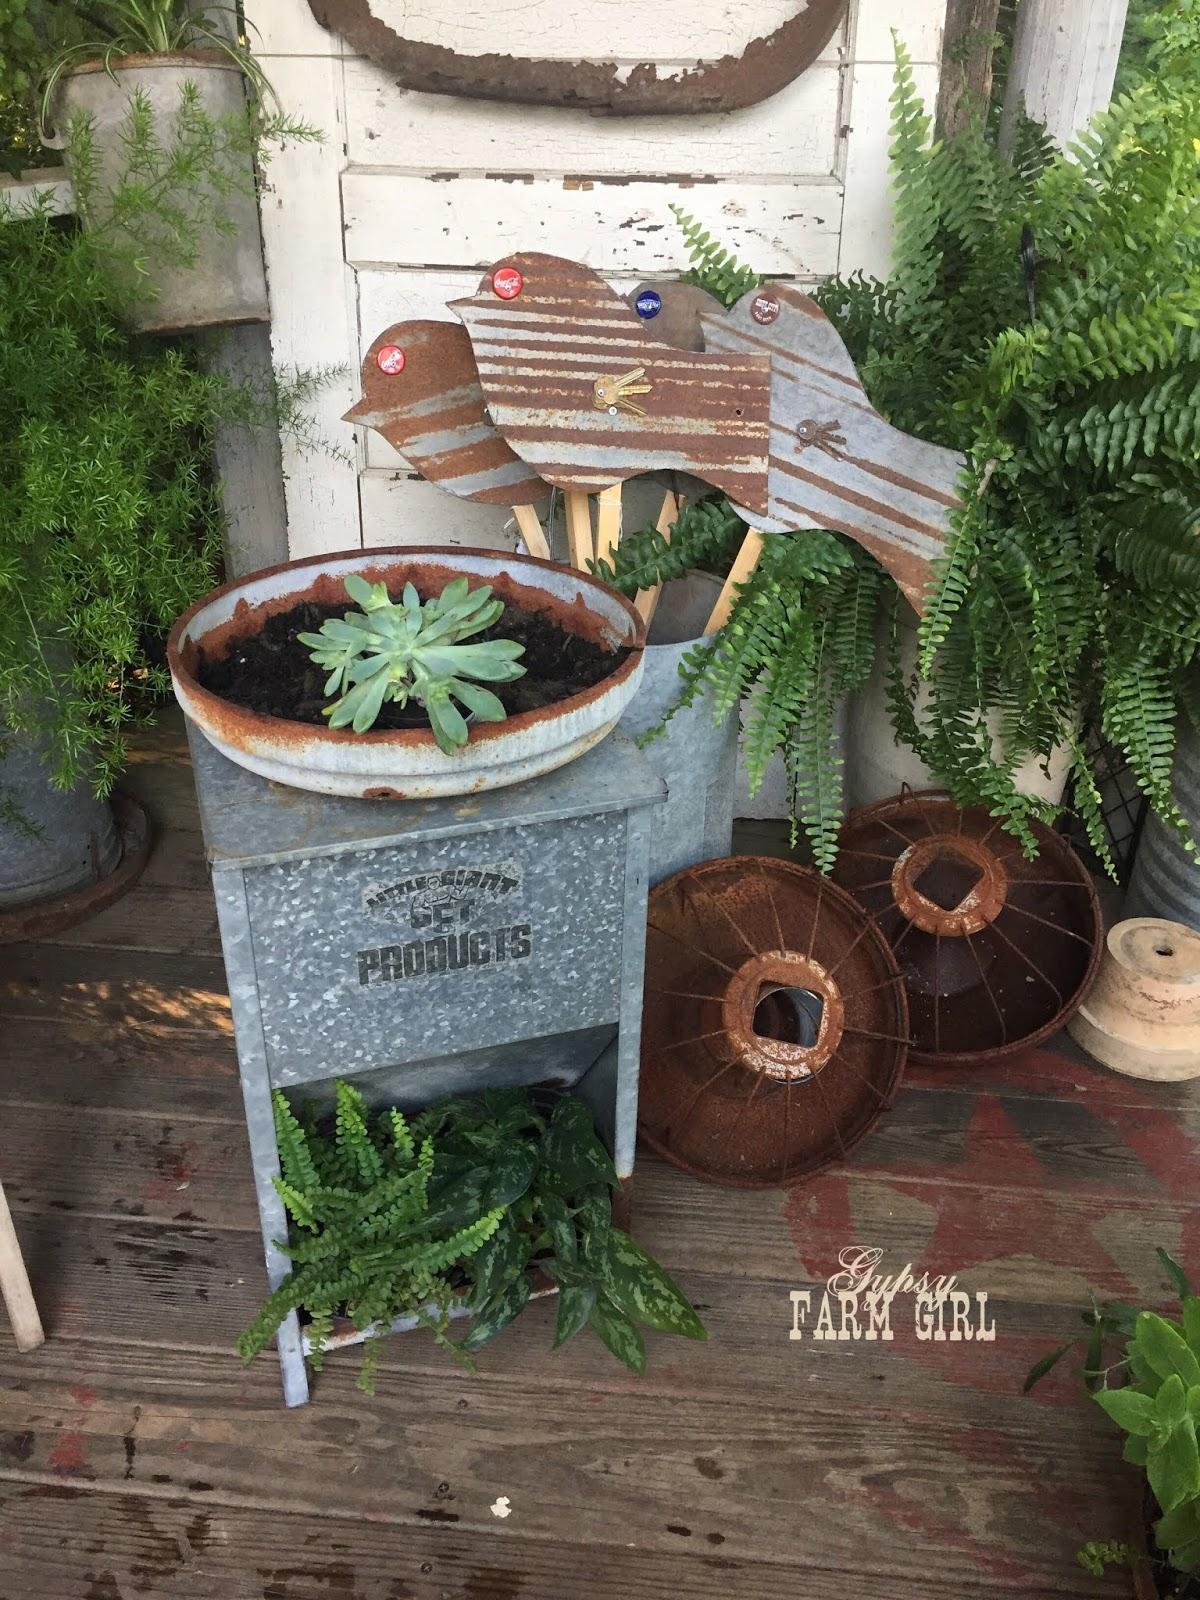 GypsyFarmGirl: How to Plant Succulents in a Vintage Chicken Feeder